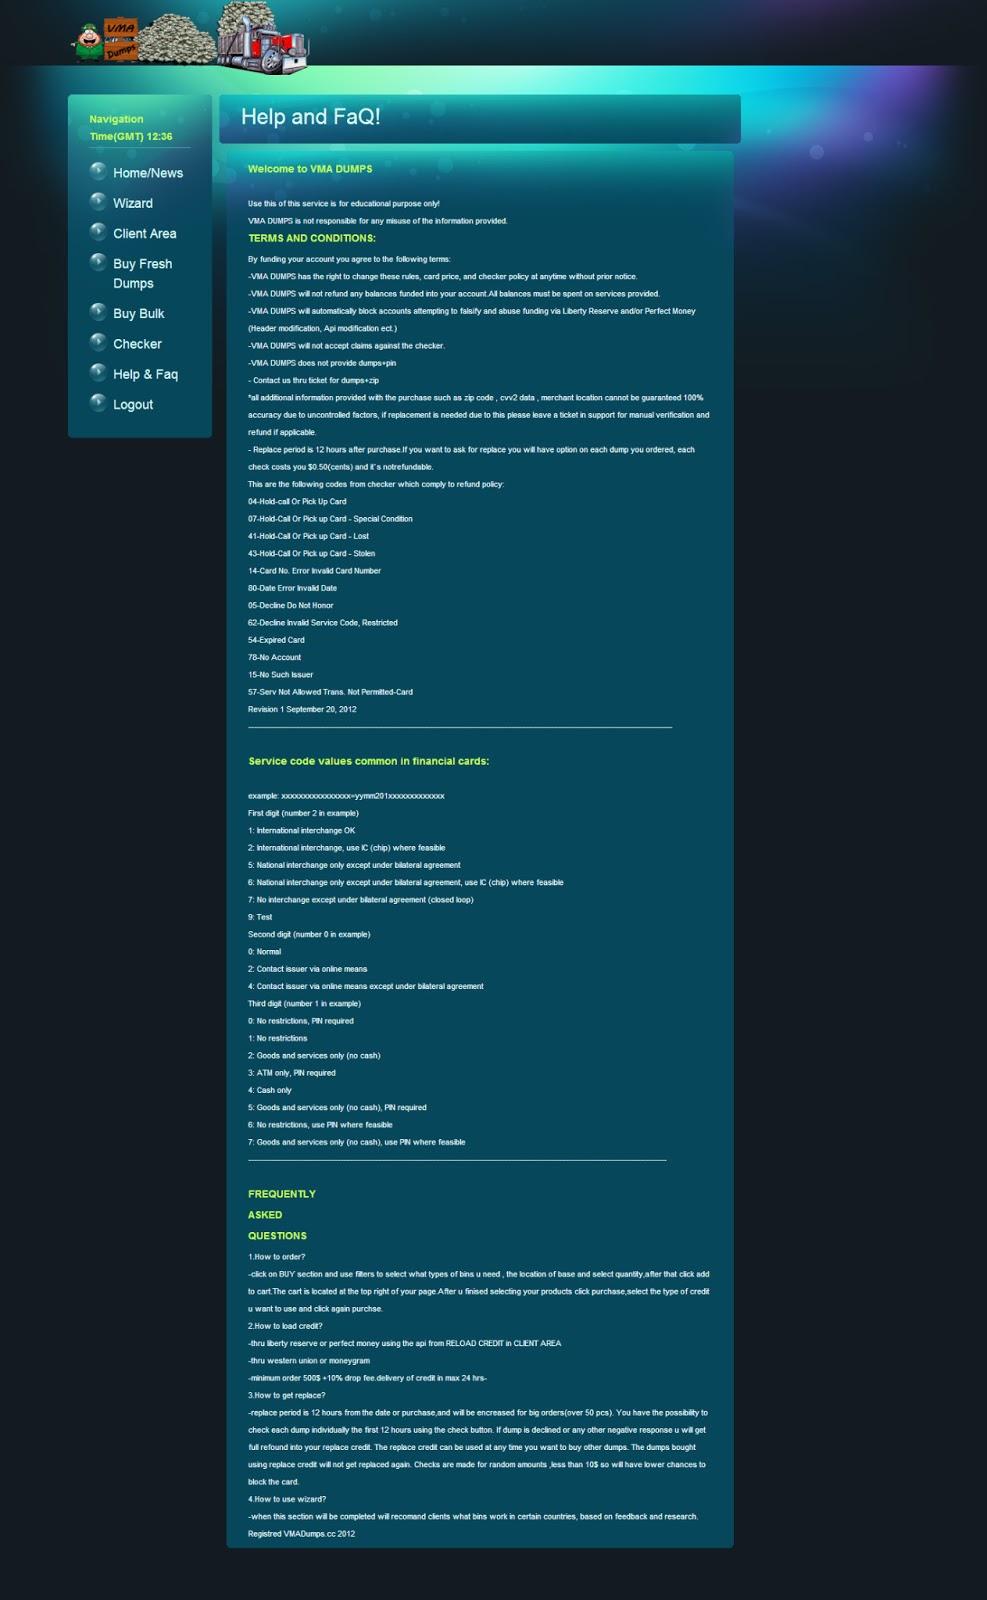 XyliBox: VMADUMPS (Carding shop)